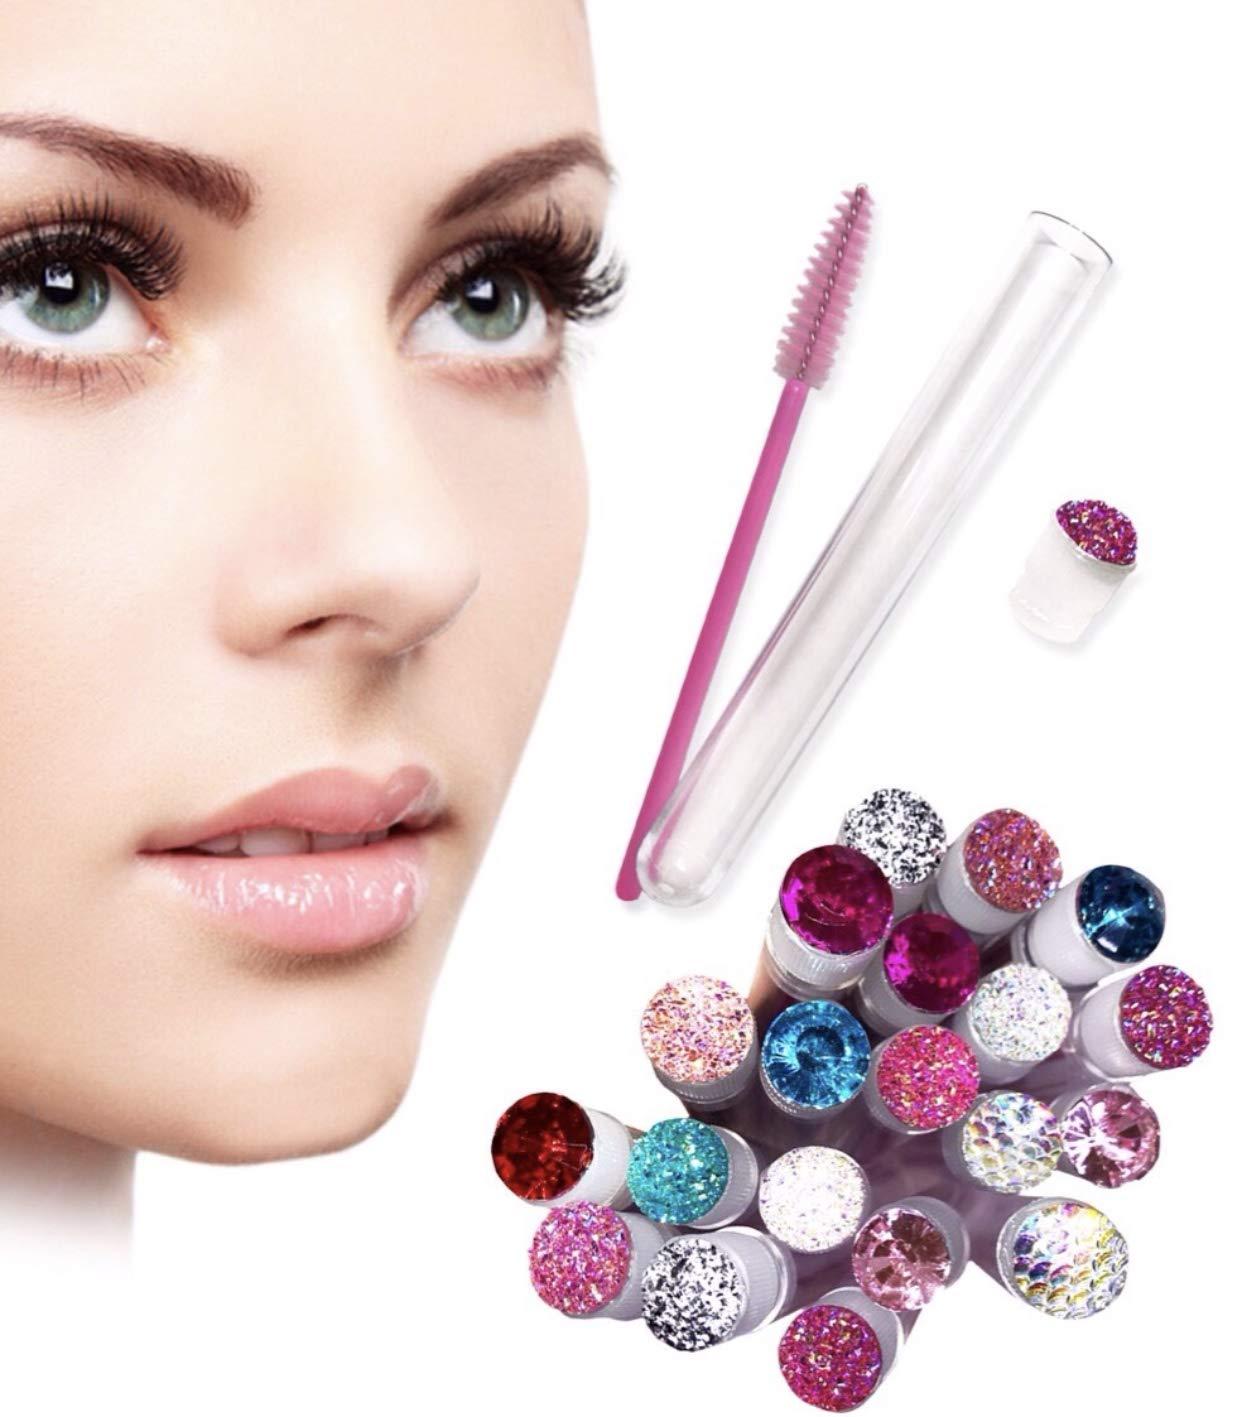 Eyelash brush - 100 pcs disposable eye lash wand and comb applicator in a tube - Make up tool for eyelash extension supplies